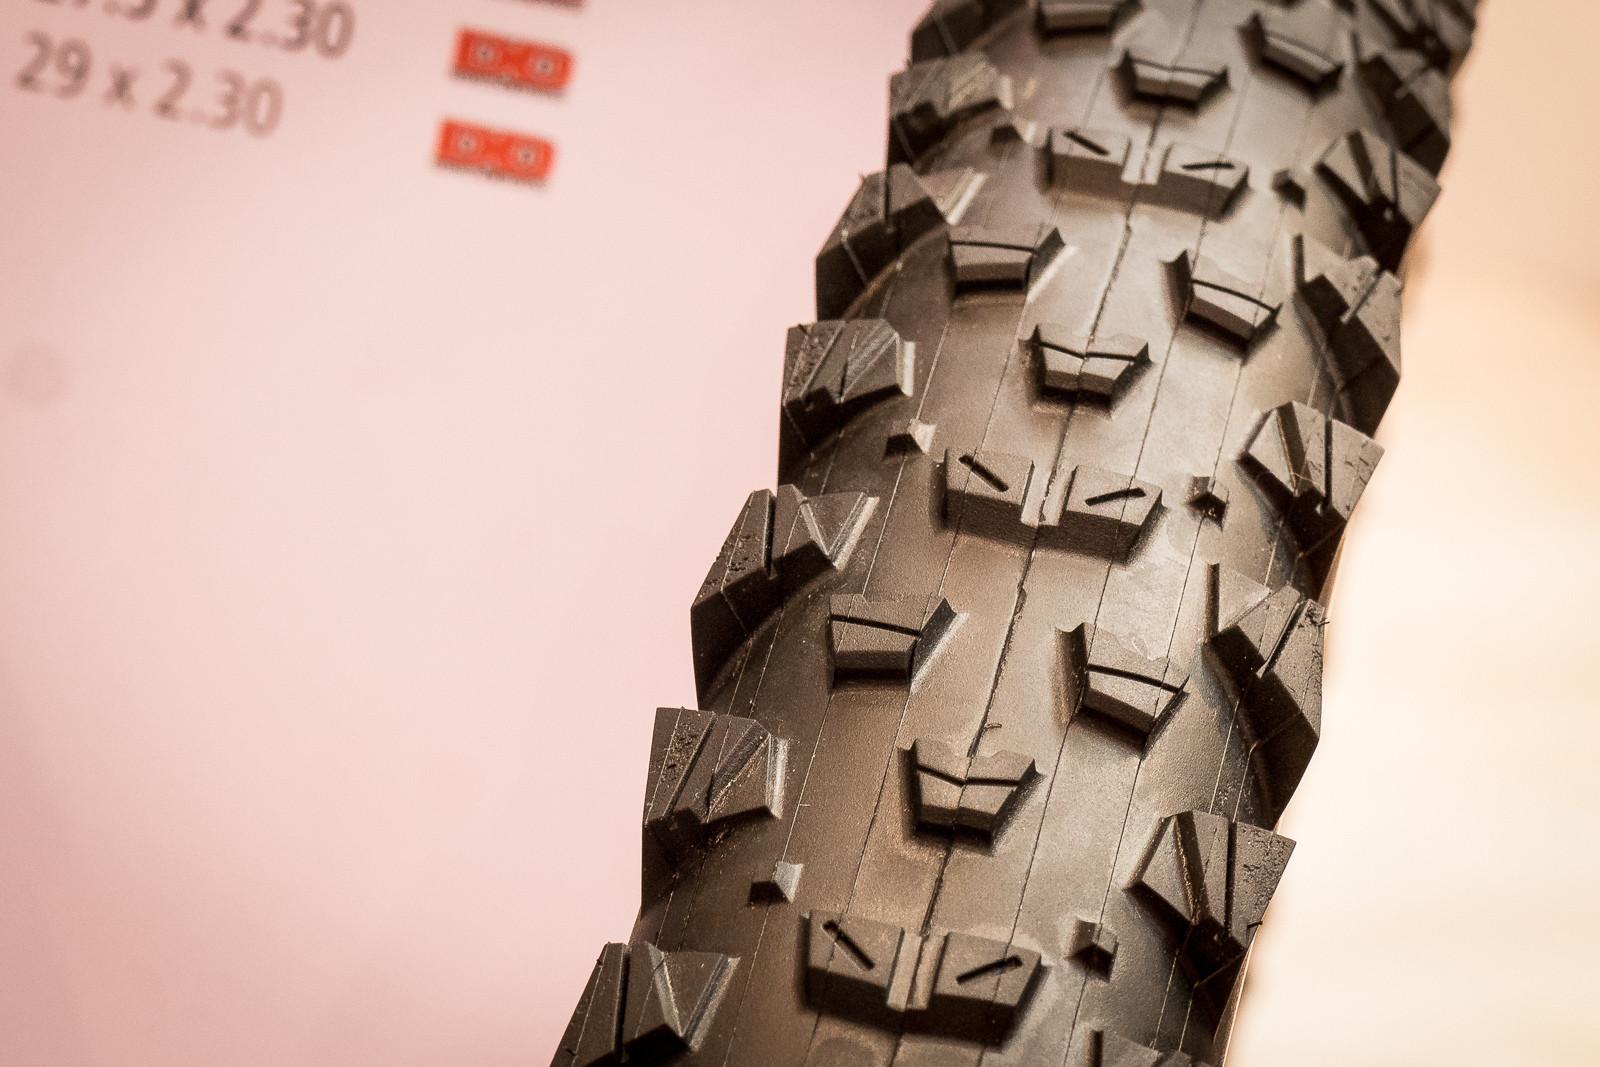 New Maxxis Tomahawk and Crossmark II Tires - 2016 Mountain Bike Components at Eurobike - Mountain Biking Pictures - Vital MTB